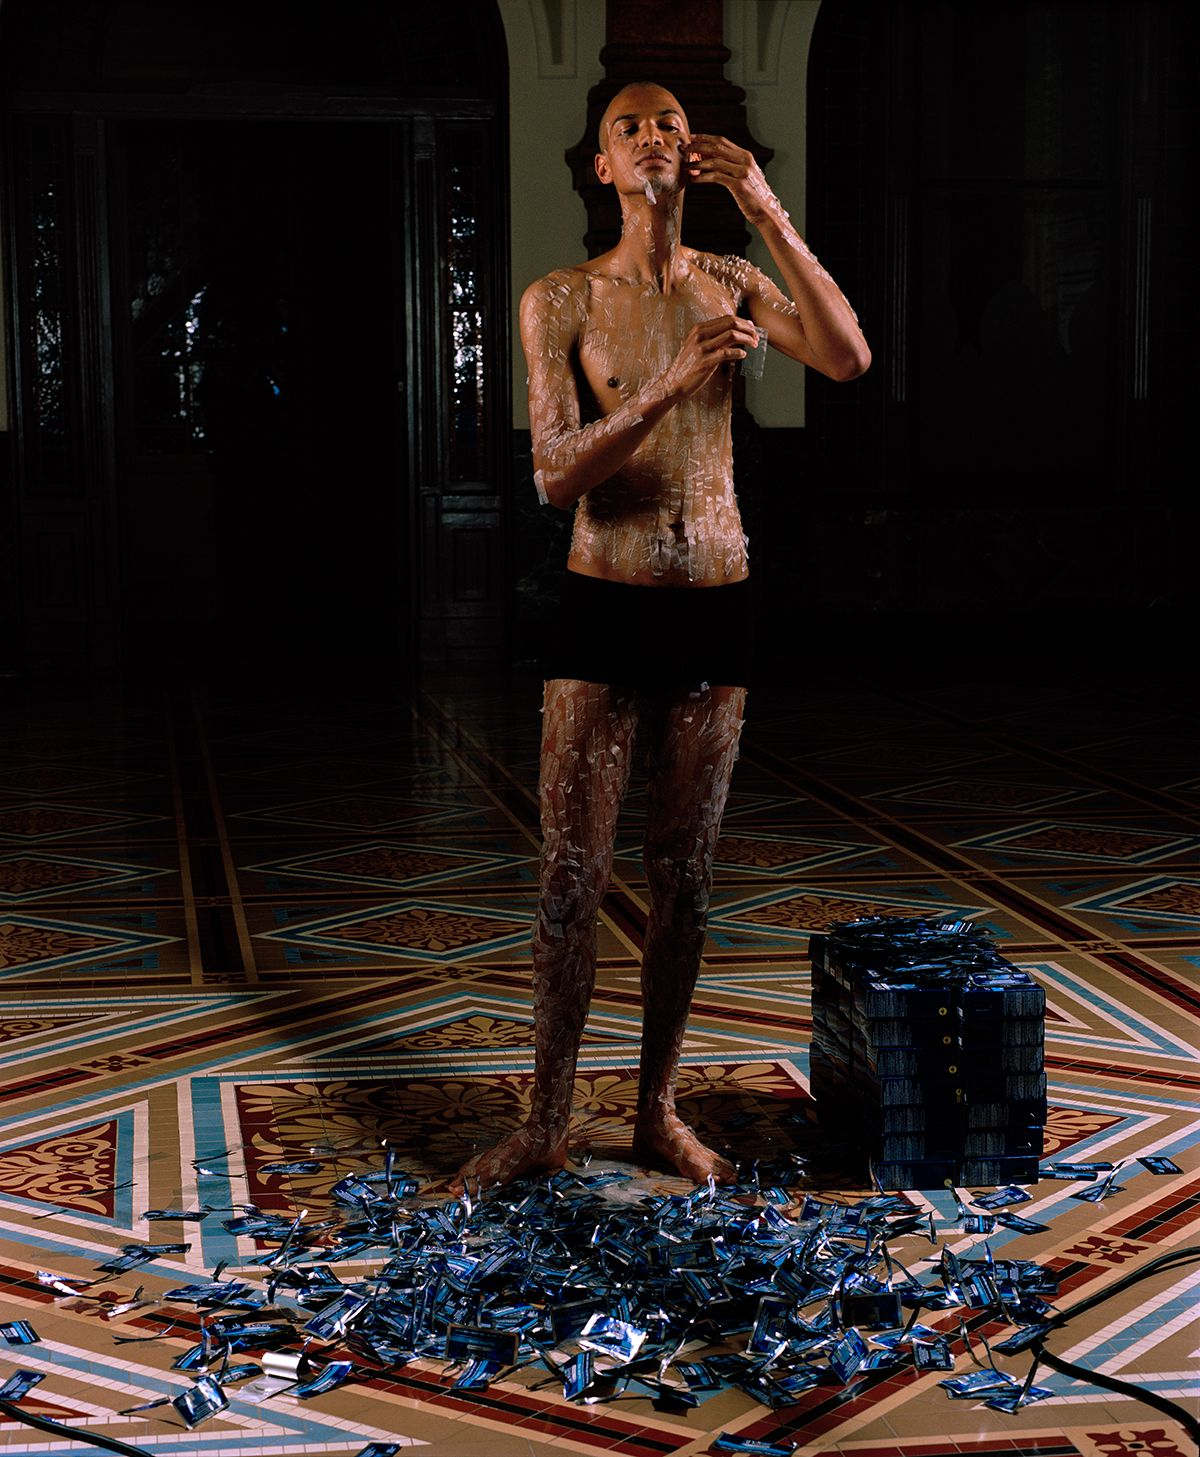 WILMER WILSON IV_Portrait with Hydrogen Peroxide Strips Performance: National Portrait Gallery, Washington, DC, 2016.